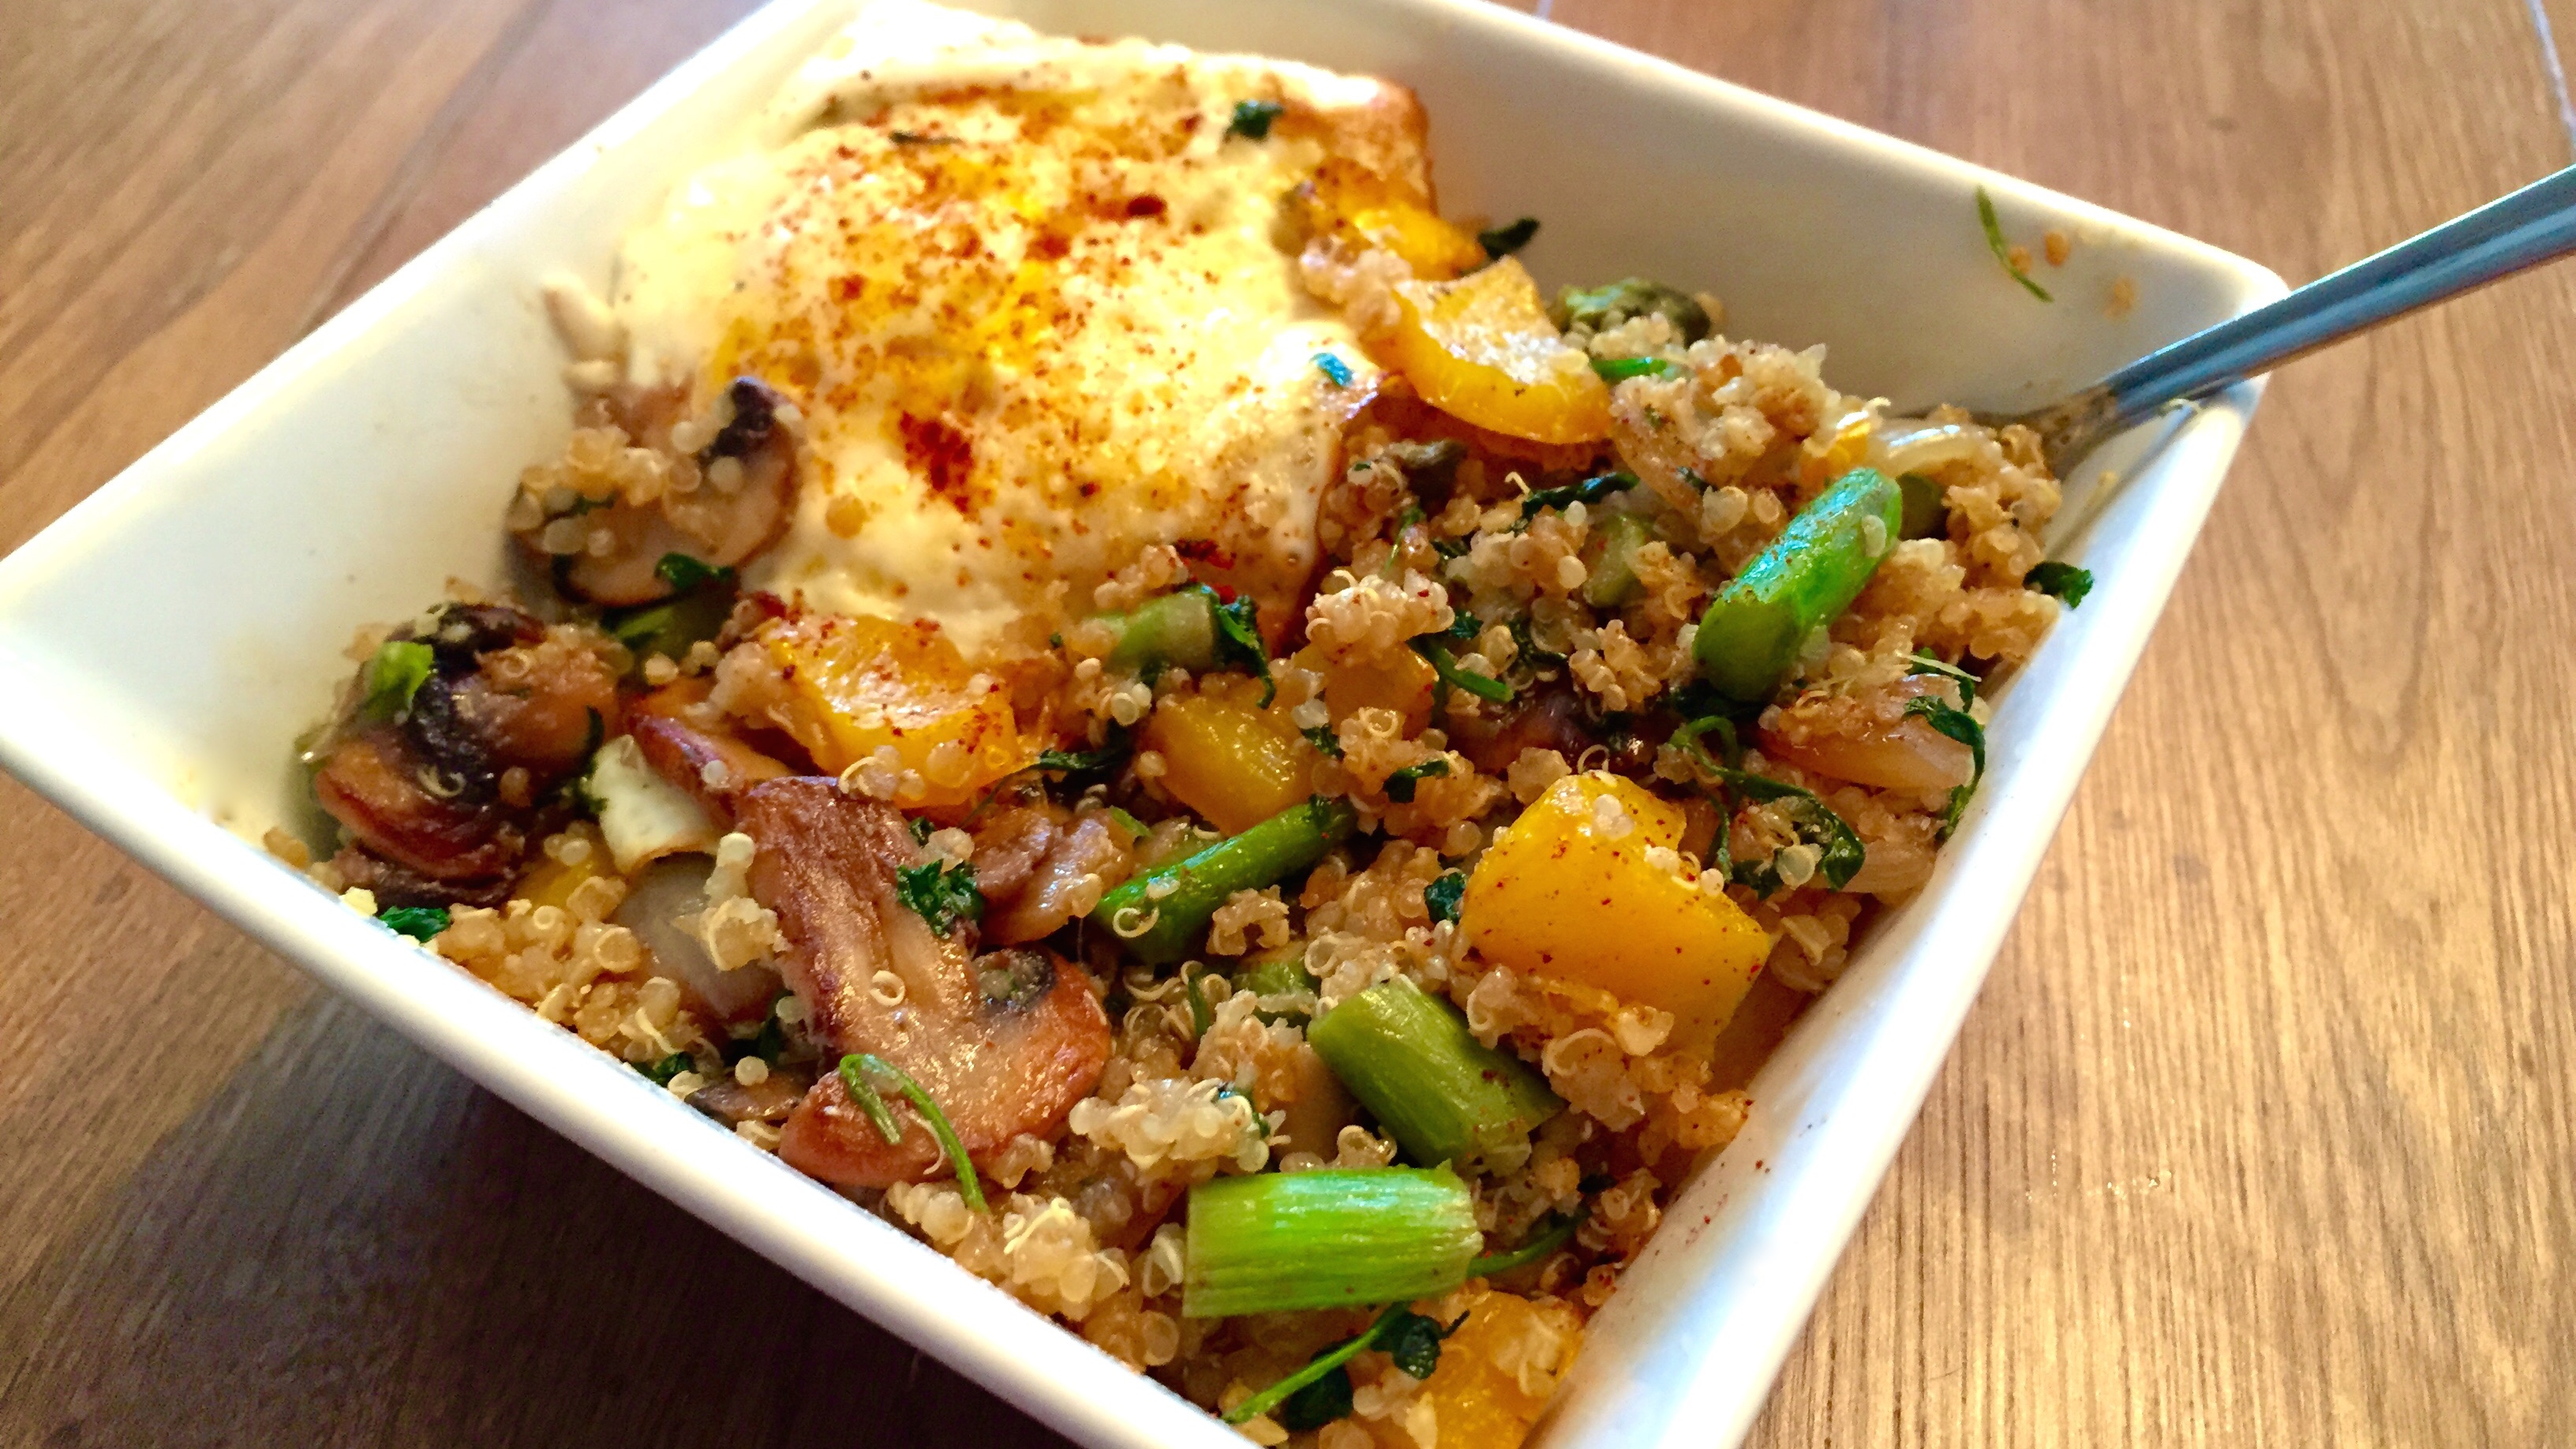 Quinoa and veggies filling whole food recipe fitness for Cuisine quinoa